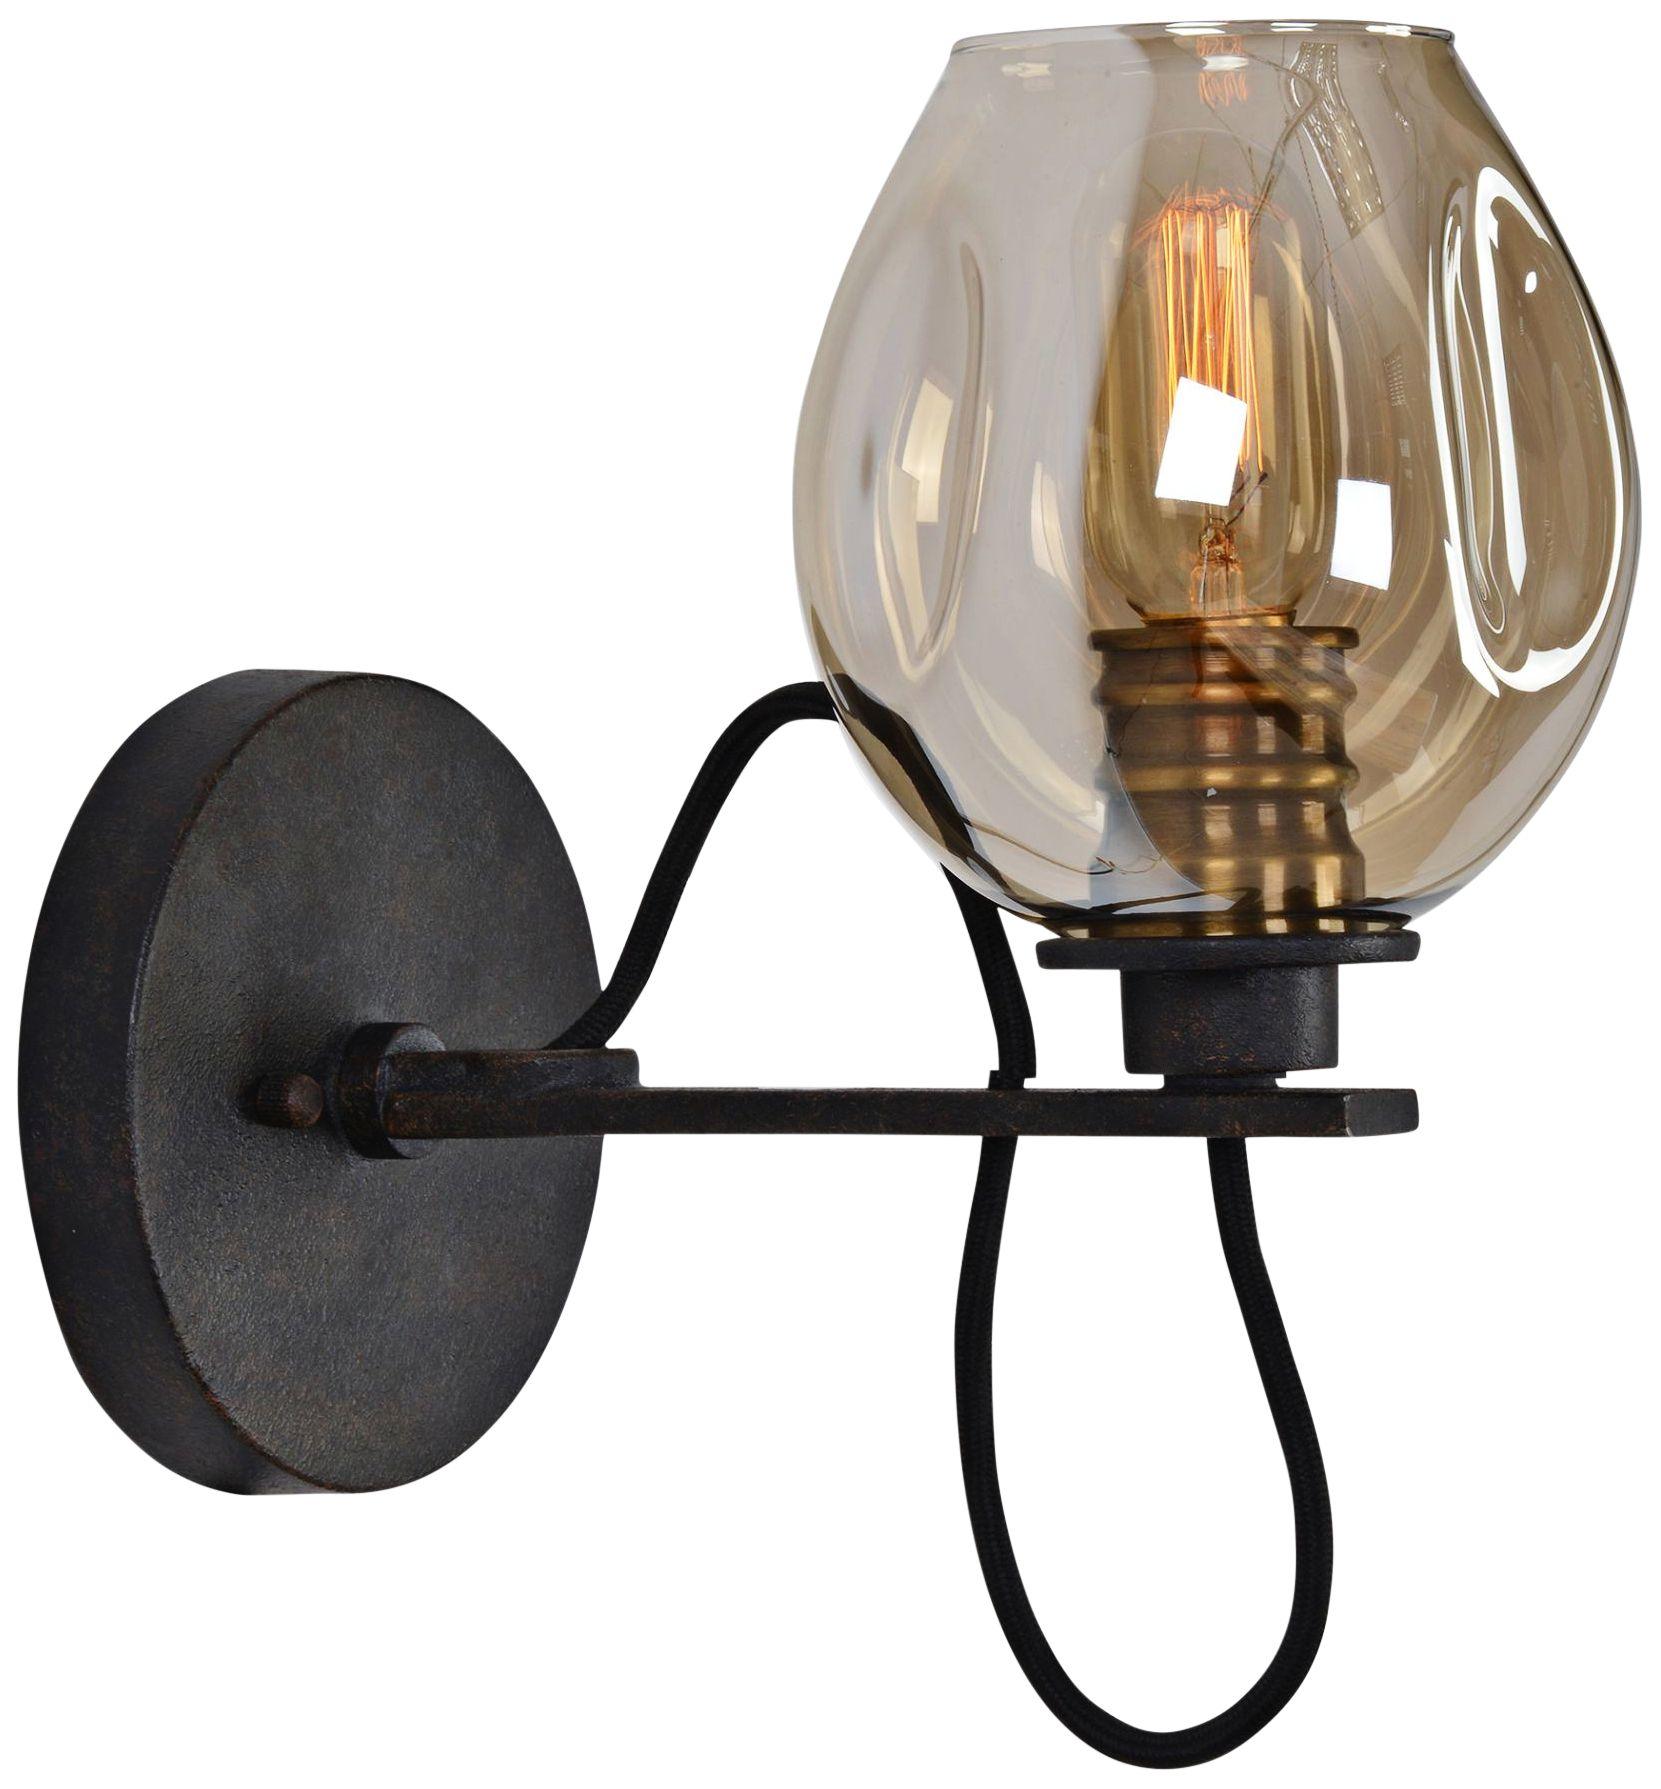 uttermost fritz 10 3 4  h bronze and golden glass wall sconce uttermost contemporary sconces   lamps plus  rh   lampsplus